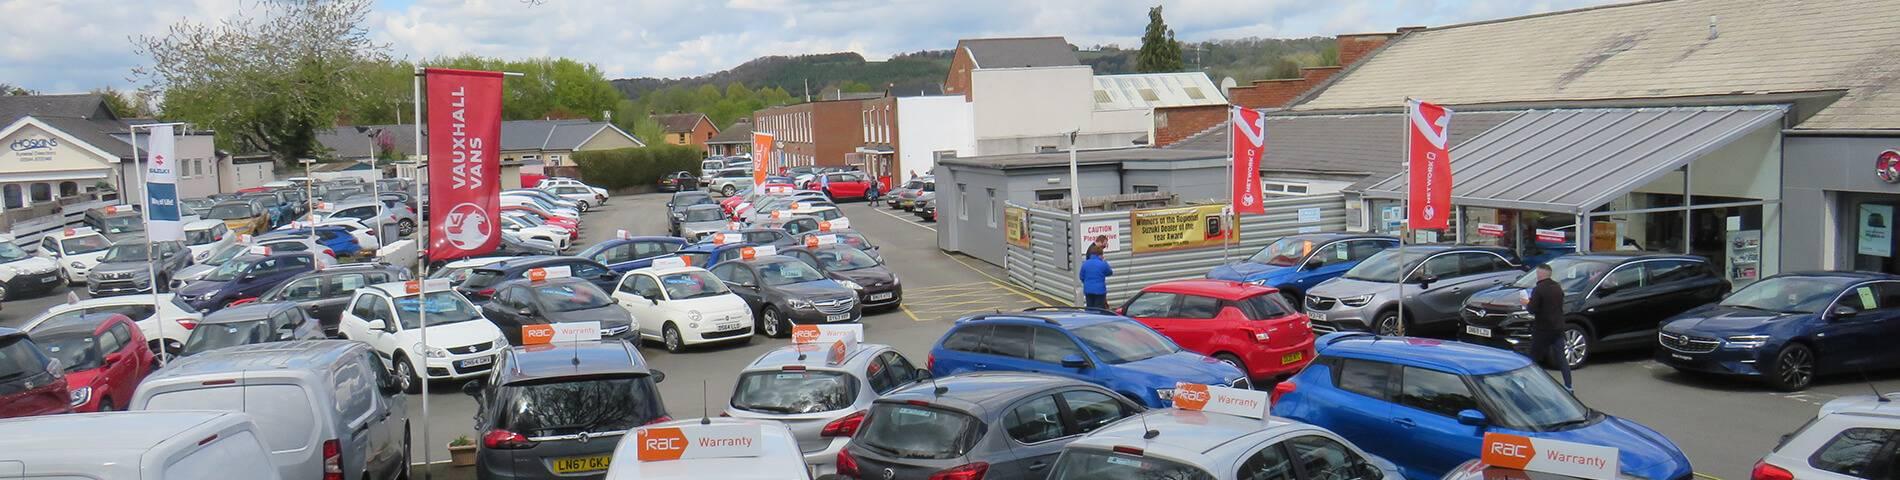 Ludlow Motors Dealership